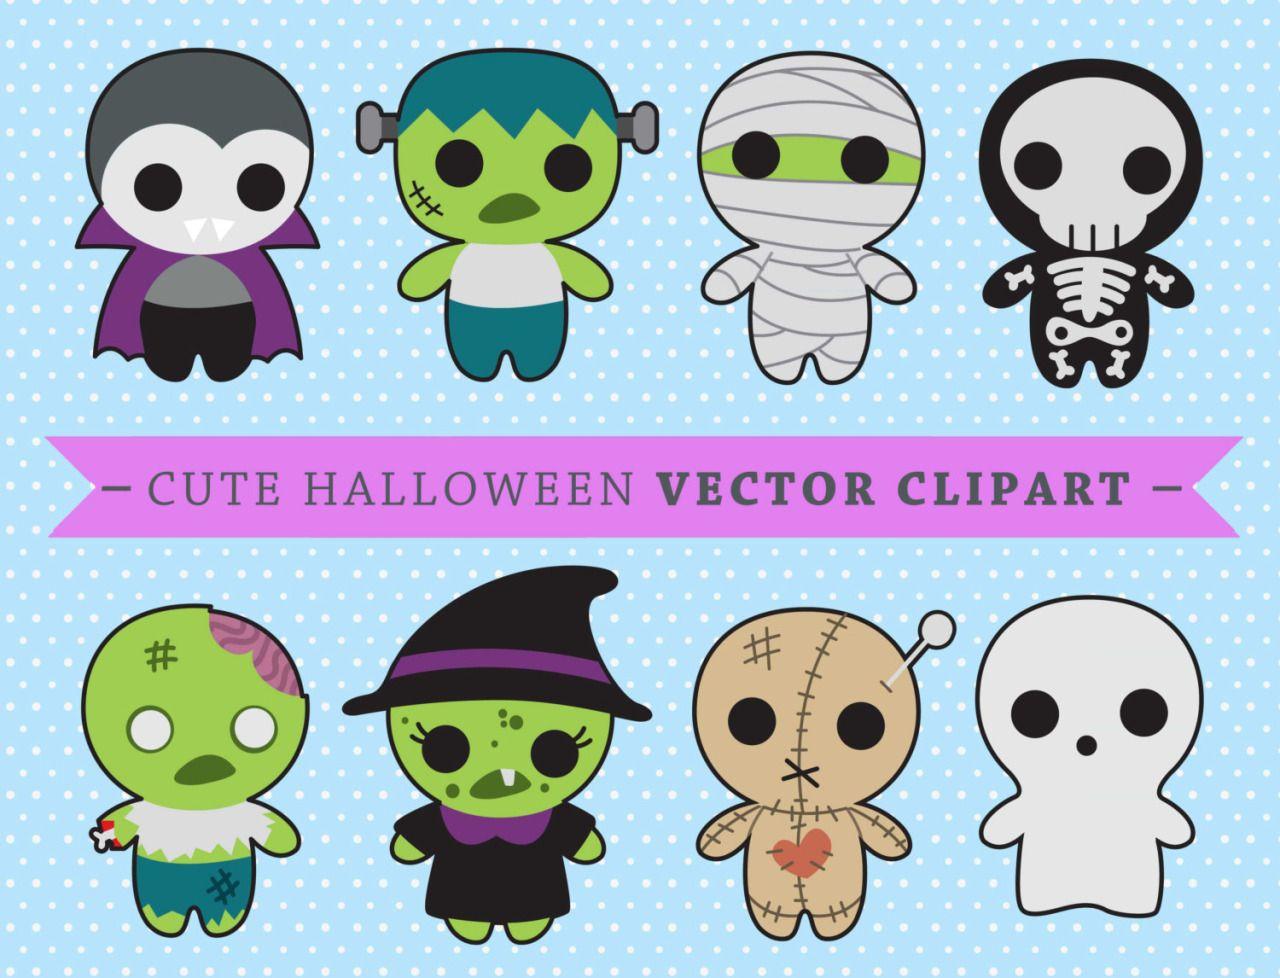 medium resolution of premium vector clipart kawaii spooky halloween halloween monsters clipart high quality vectors instant download kawaii clipart